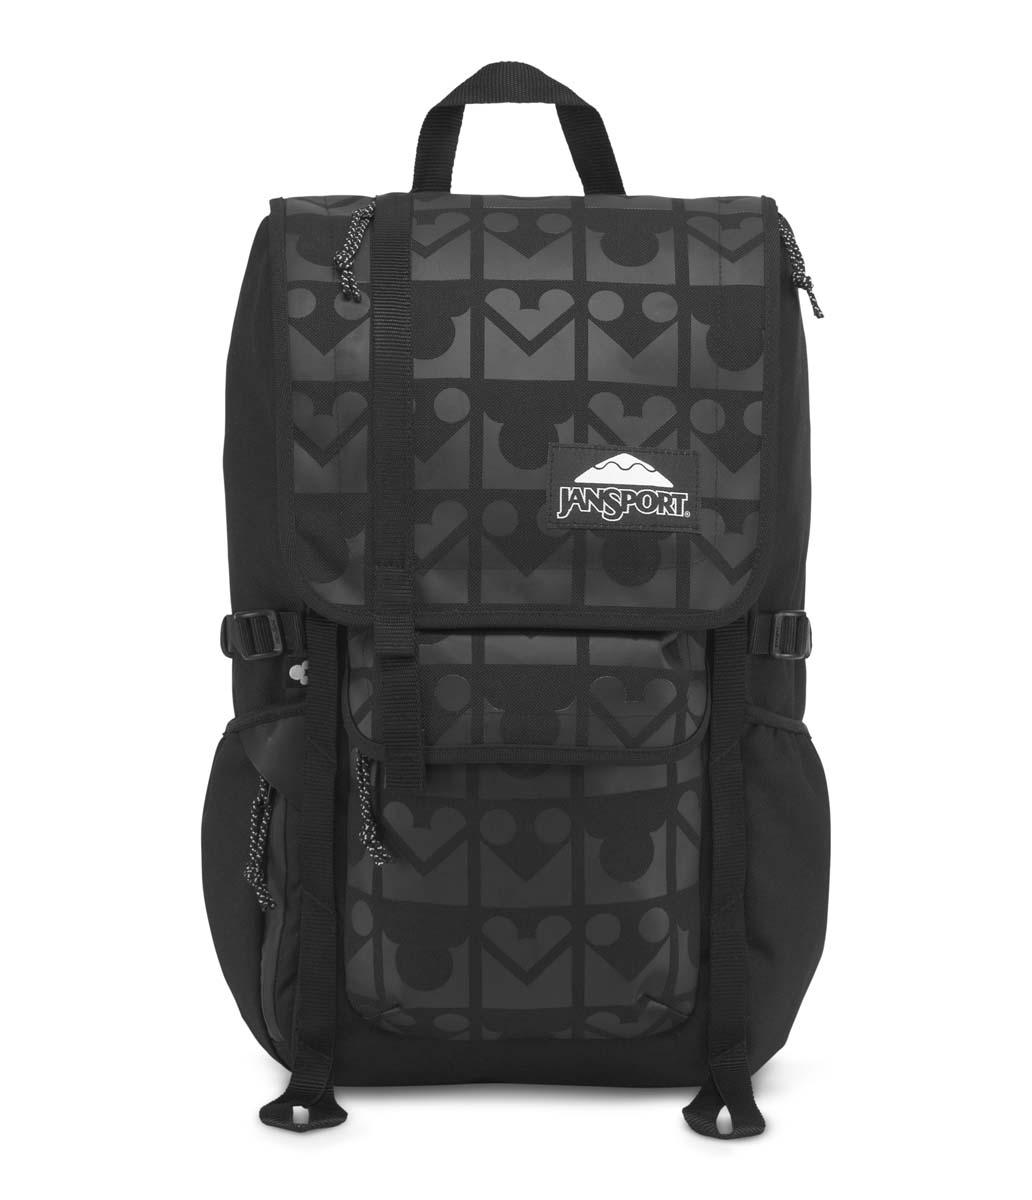 JanSport กระเป๋าเป้ รุ่น Disney Hatchet SE - Disney Stealth Mickey